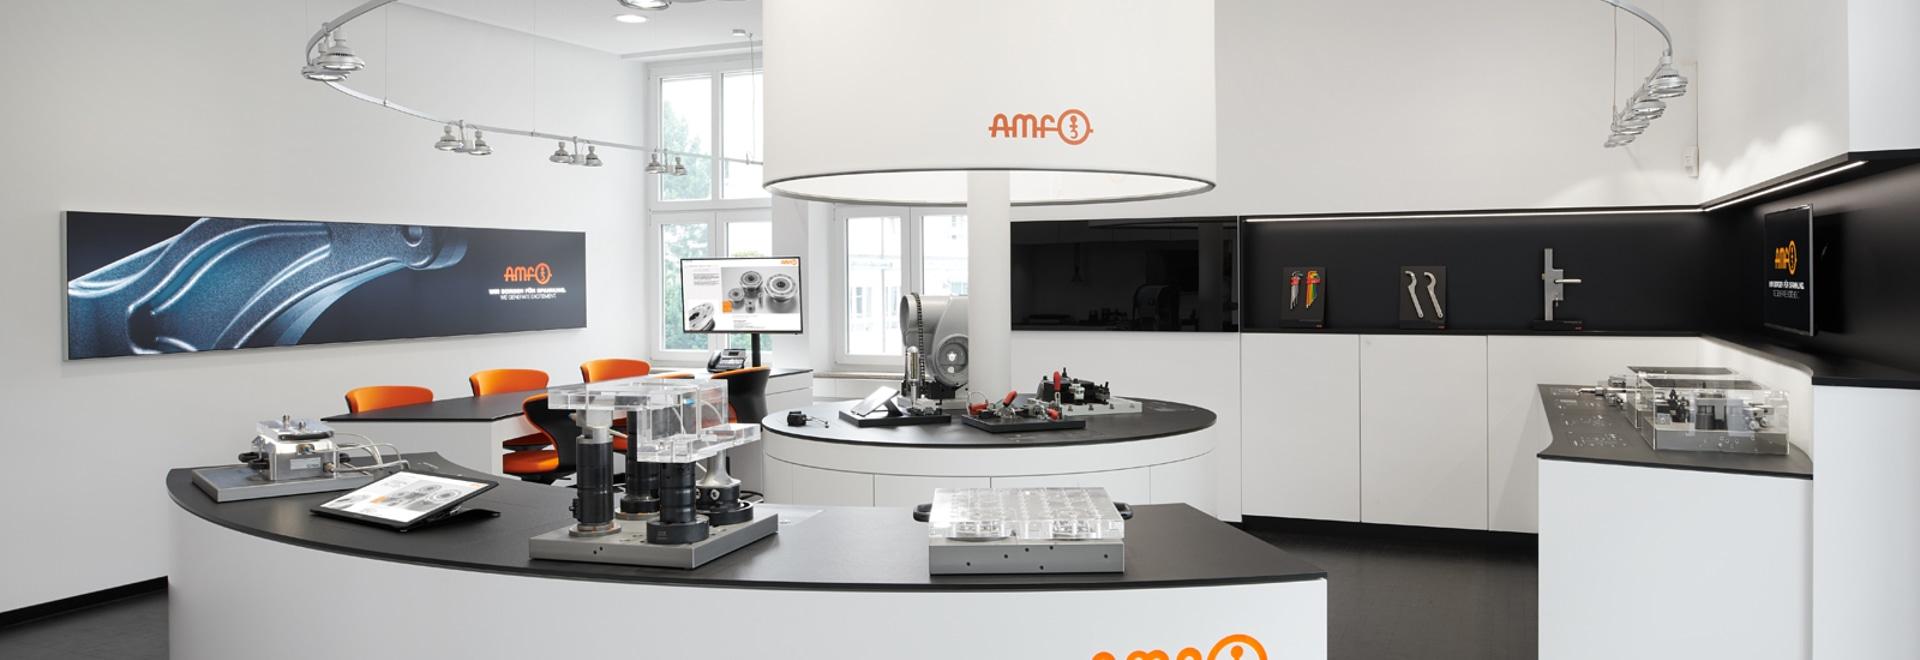 AMF ist GERMAN DESIGN AWARD WINNER 2019.